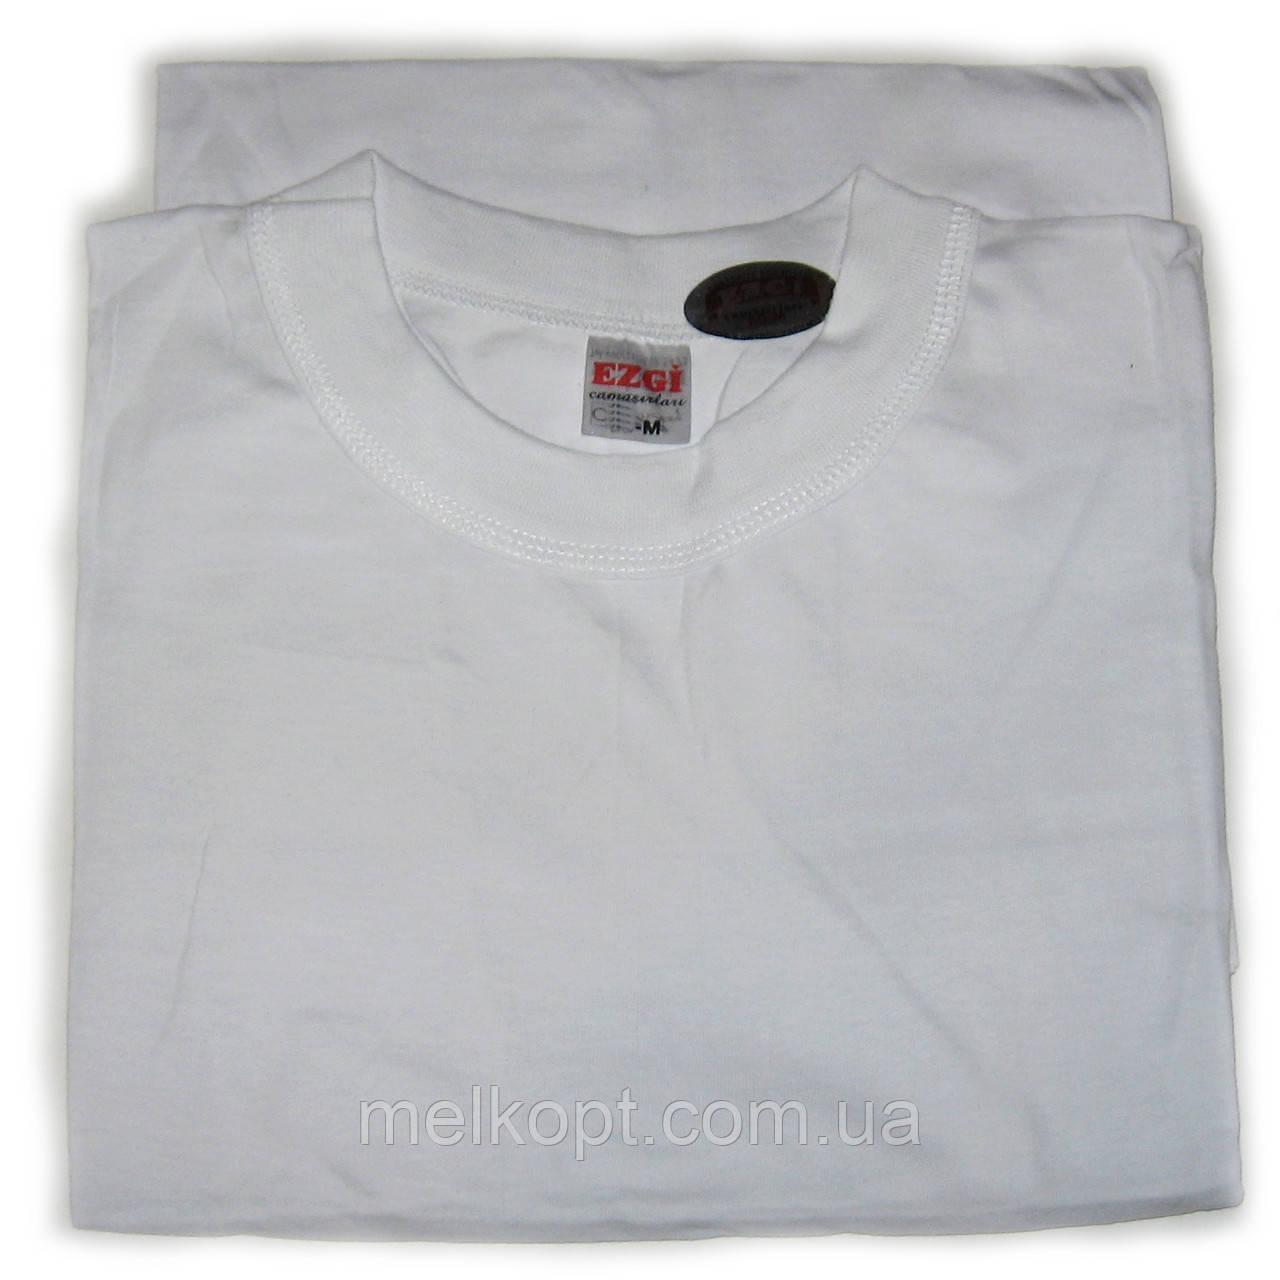 Мужские футболки Ezgi - 63,00 грн./шт. (66-й размер, белые)